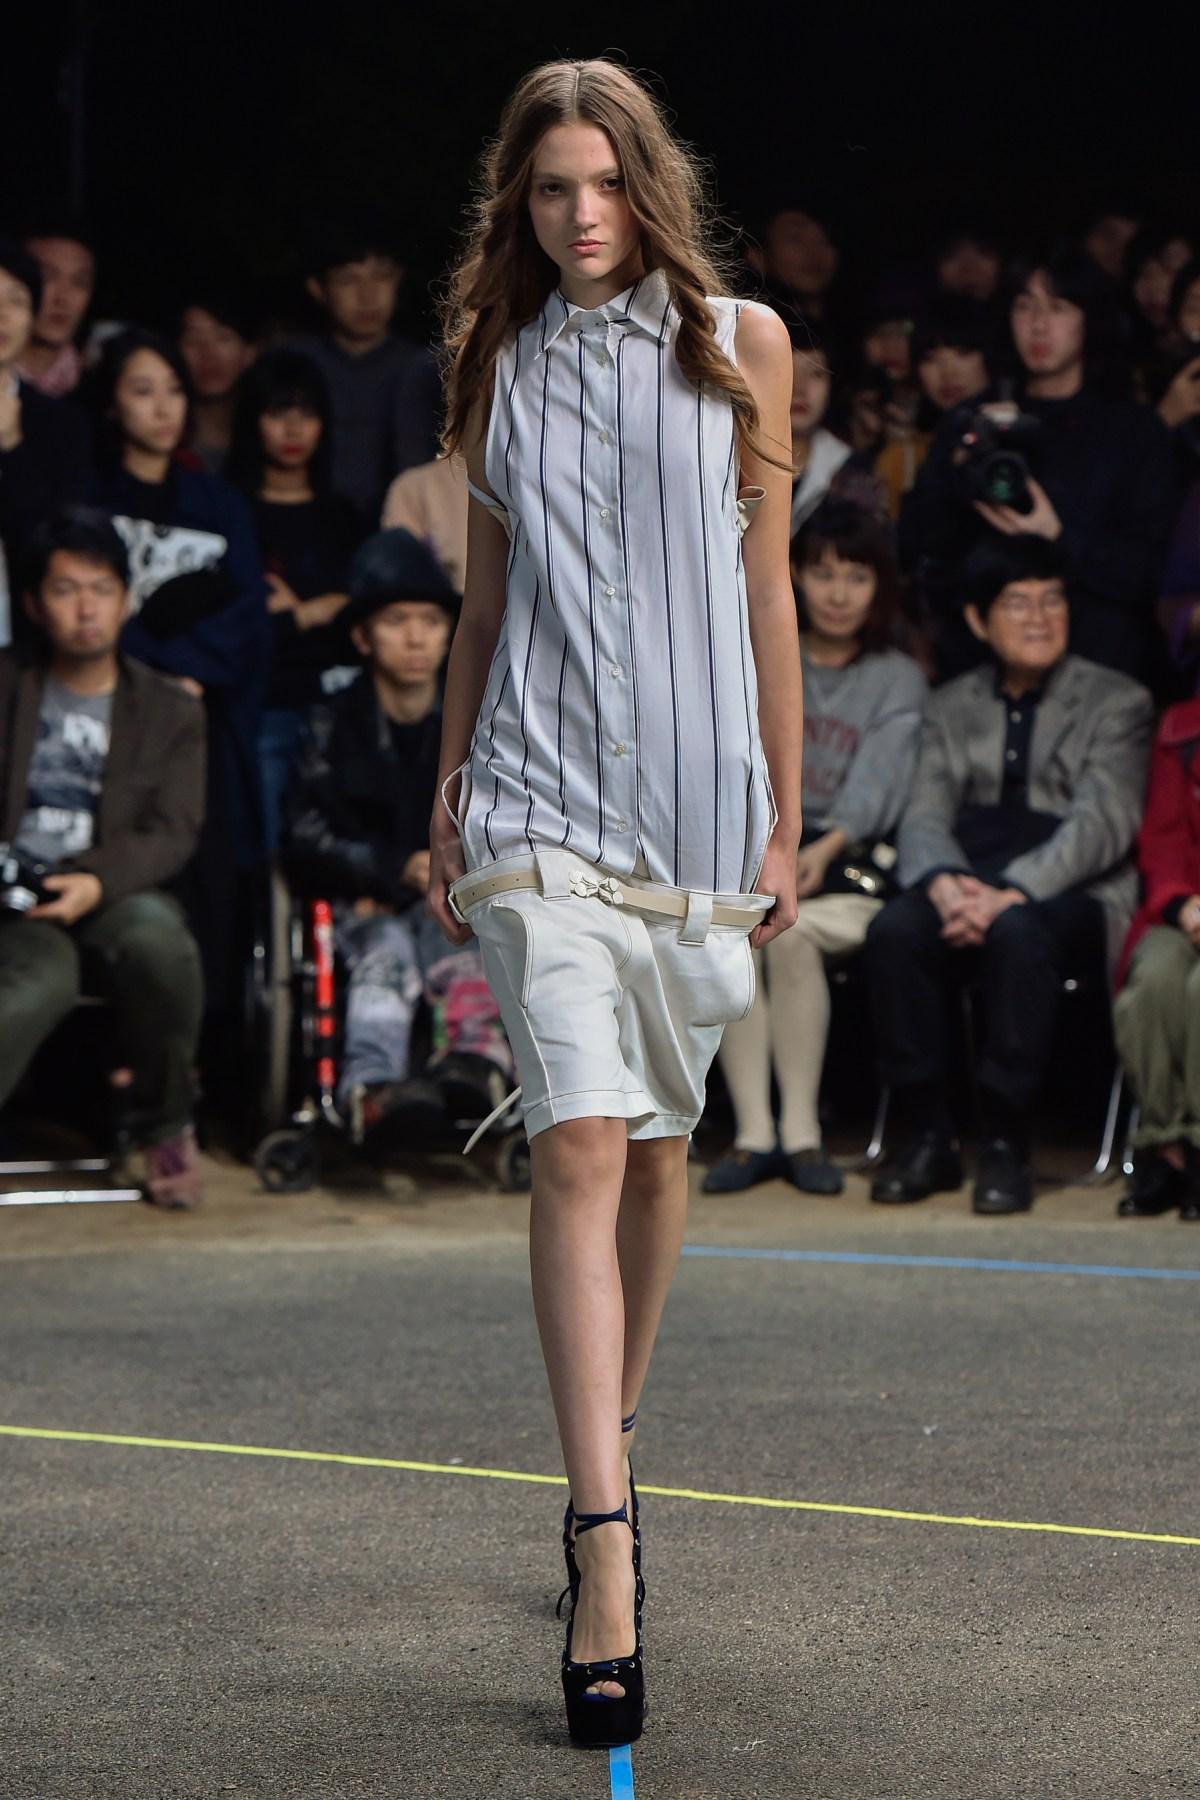 Mikio Sakabe RS17 017